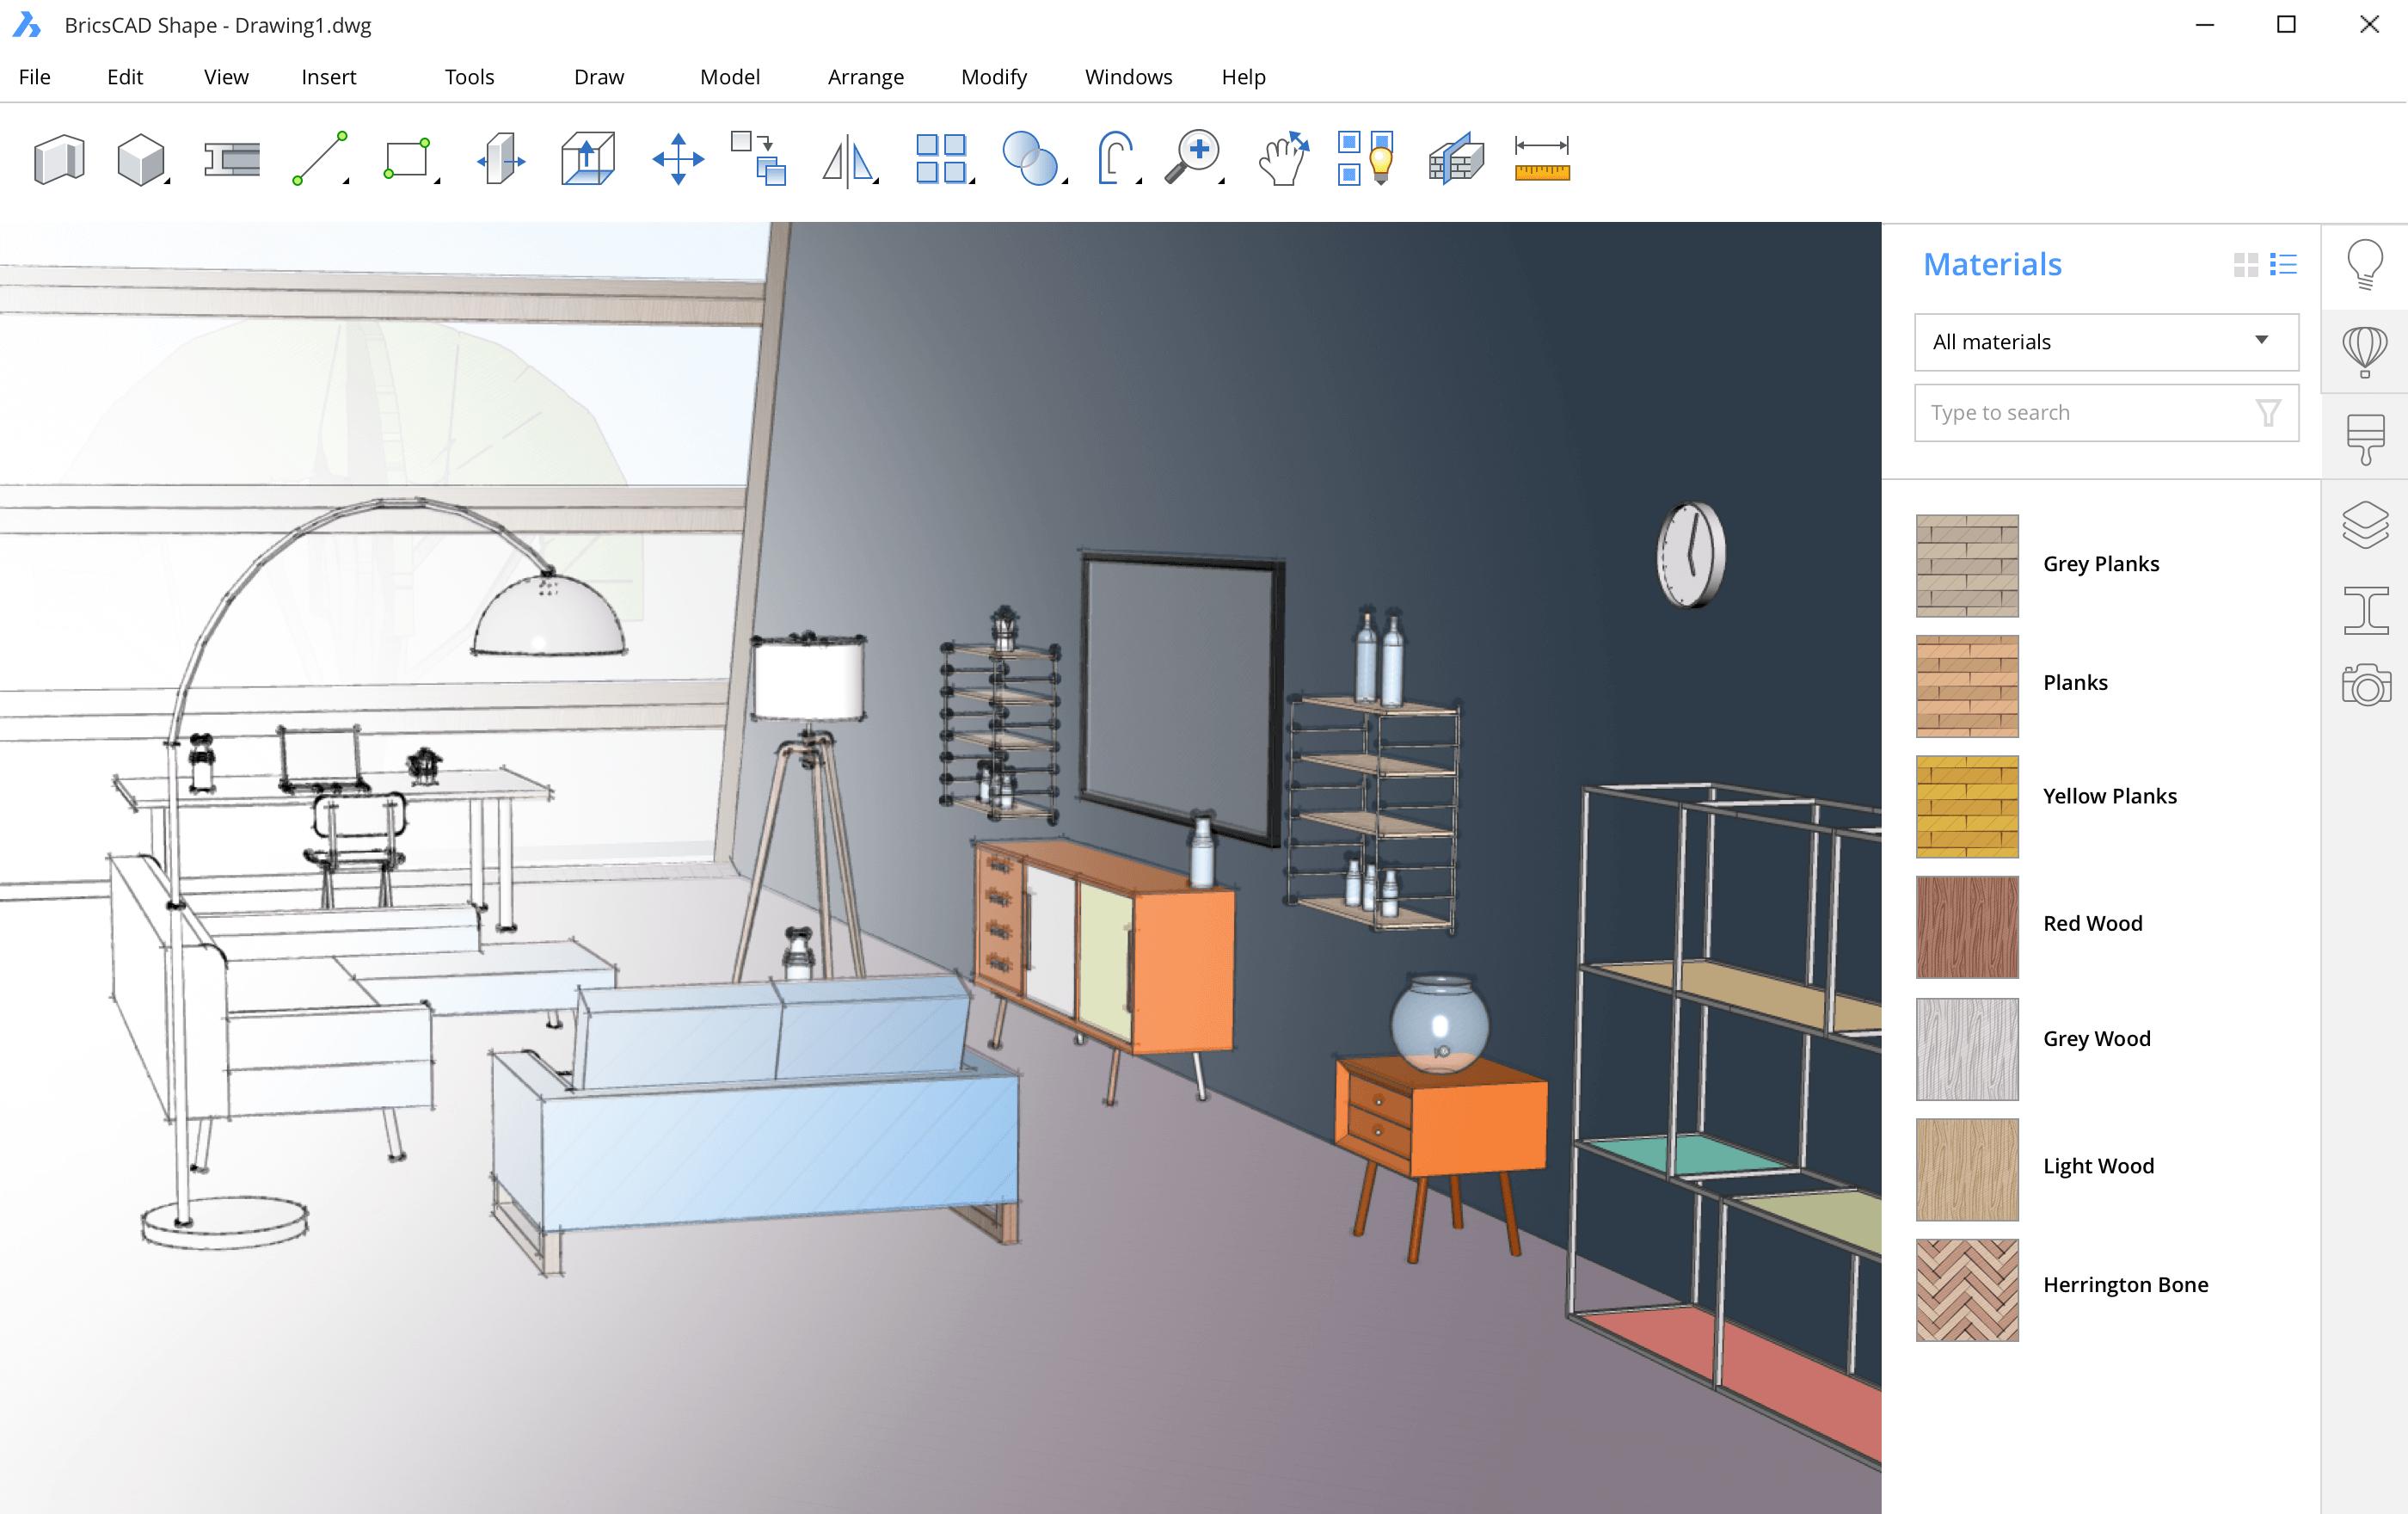 Bricscad Shape Free 3d Design Software 3d Design Software